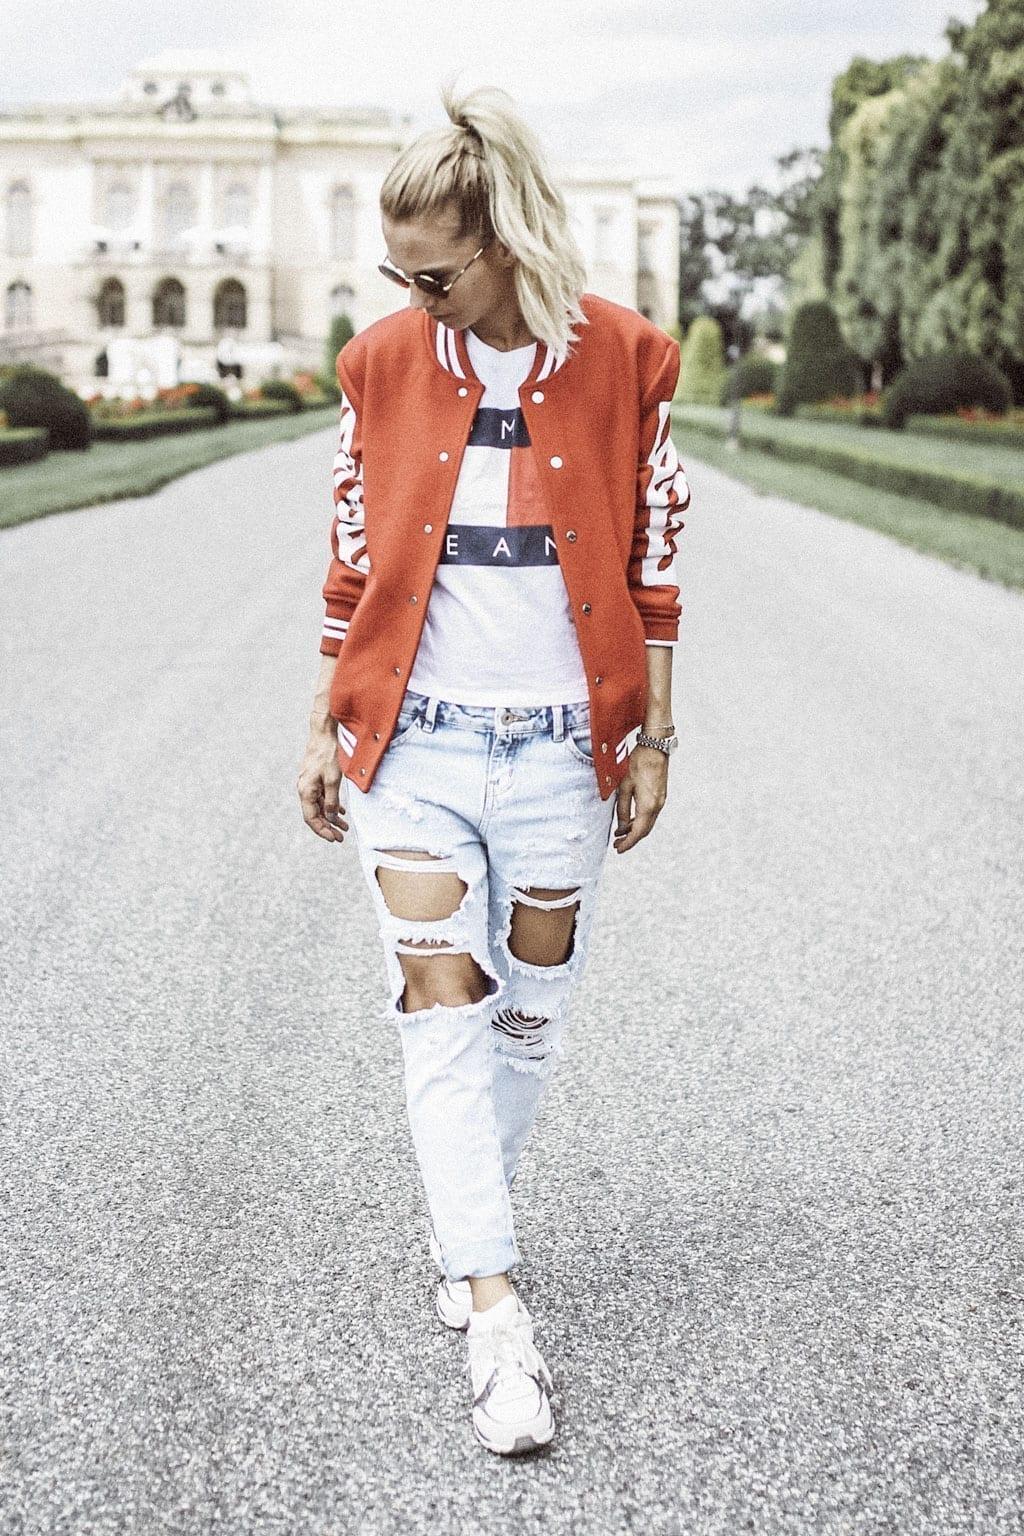 Constantly-K-karin-kaswurm-white-red-rieger-jacket-salzburg-fashion-street-style-9043